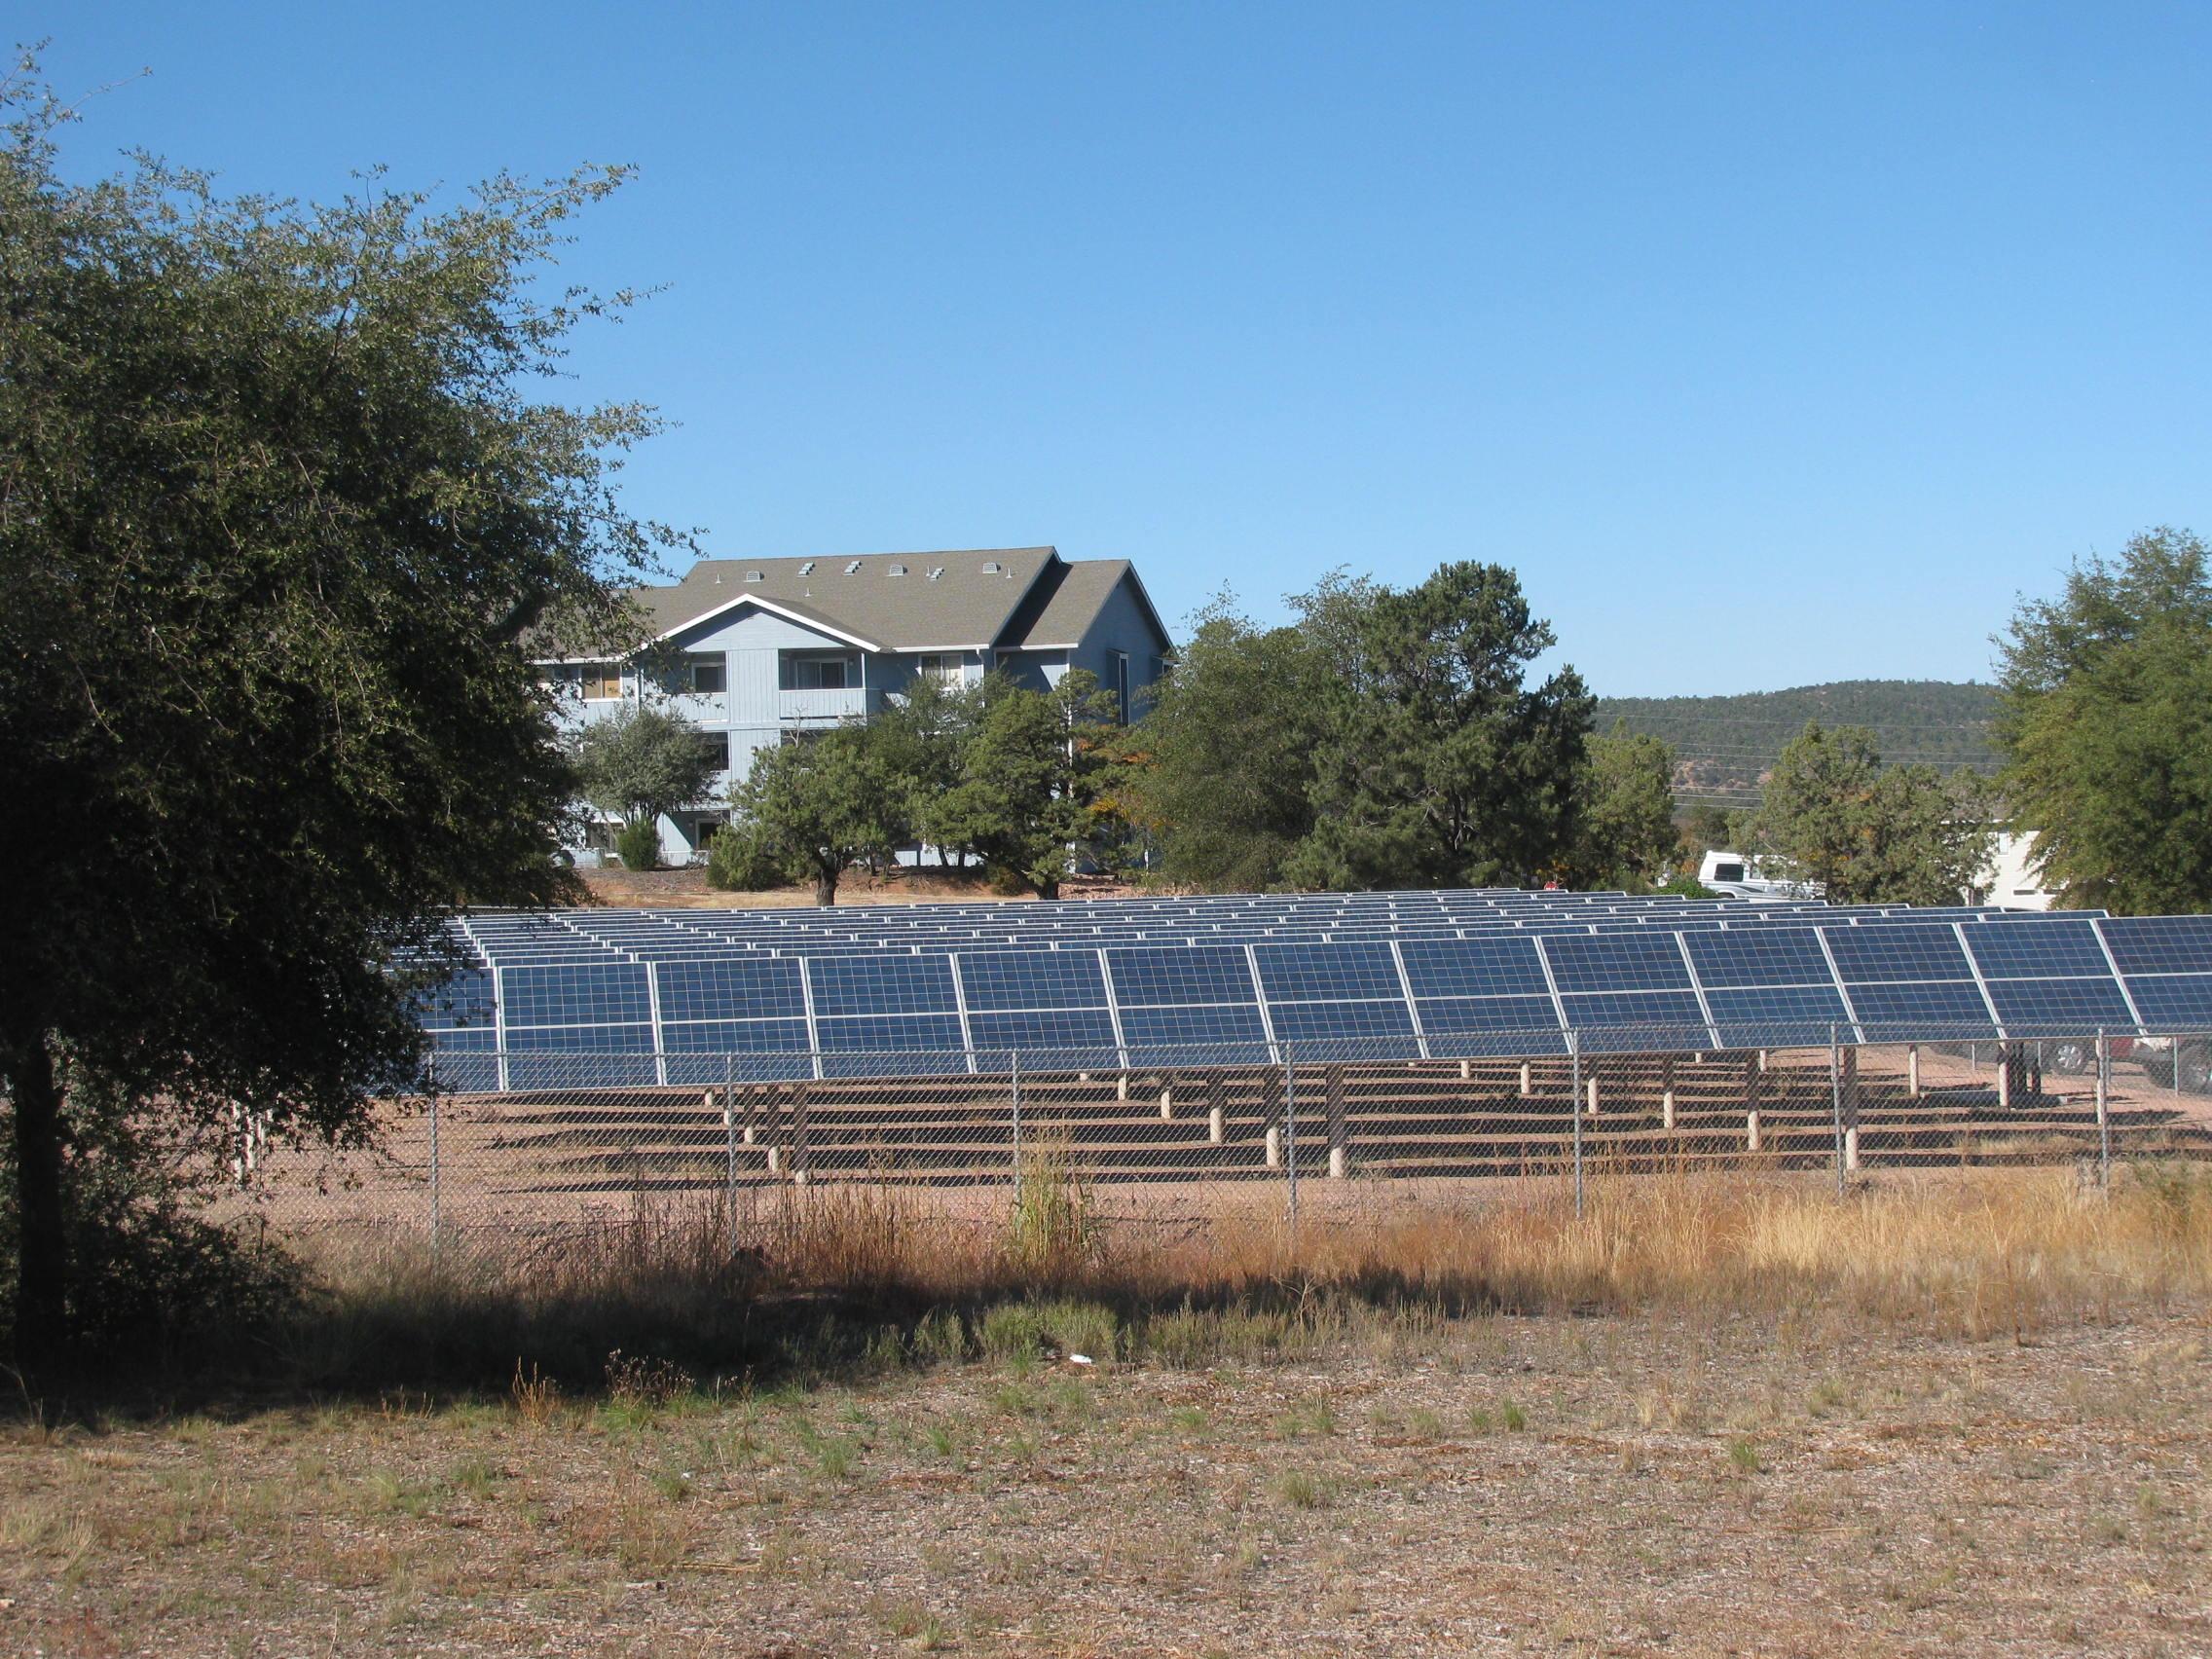 renewable vs non renewable resources basic science transition renewable sun tracking solar array